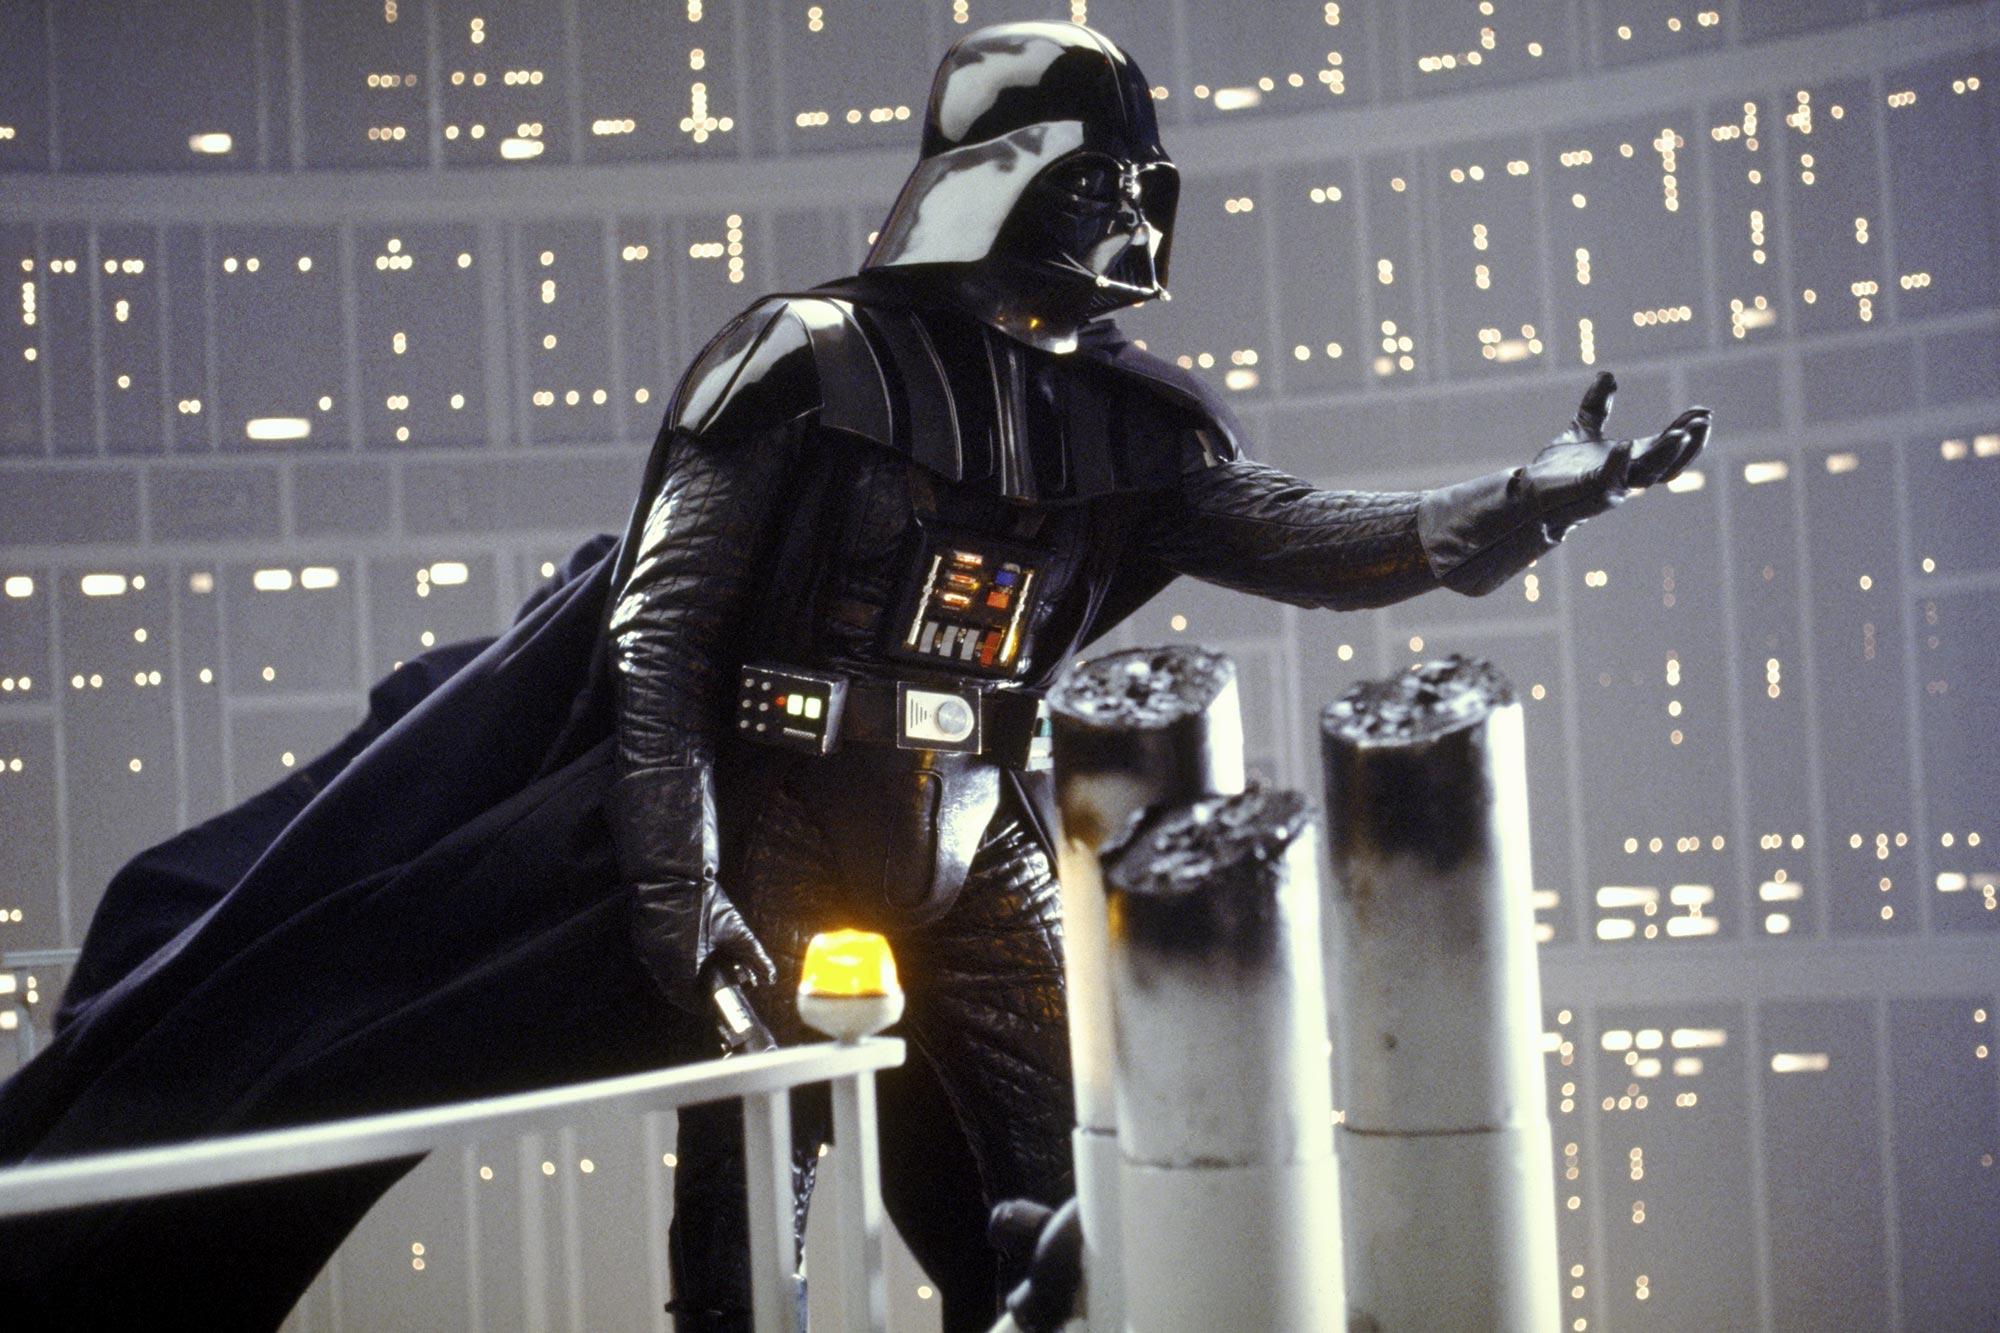 Star Wars Ranking Star Wars Episode V: The Empire Strikes Back (1980)